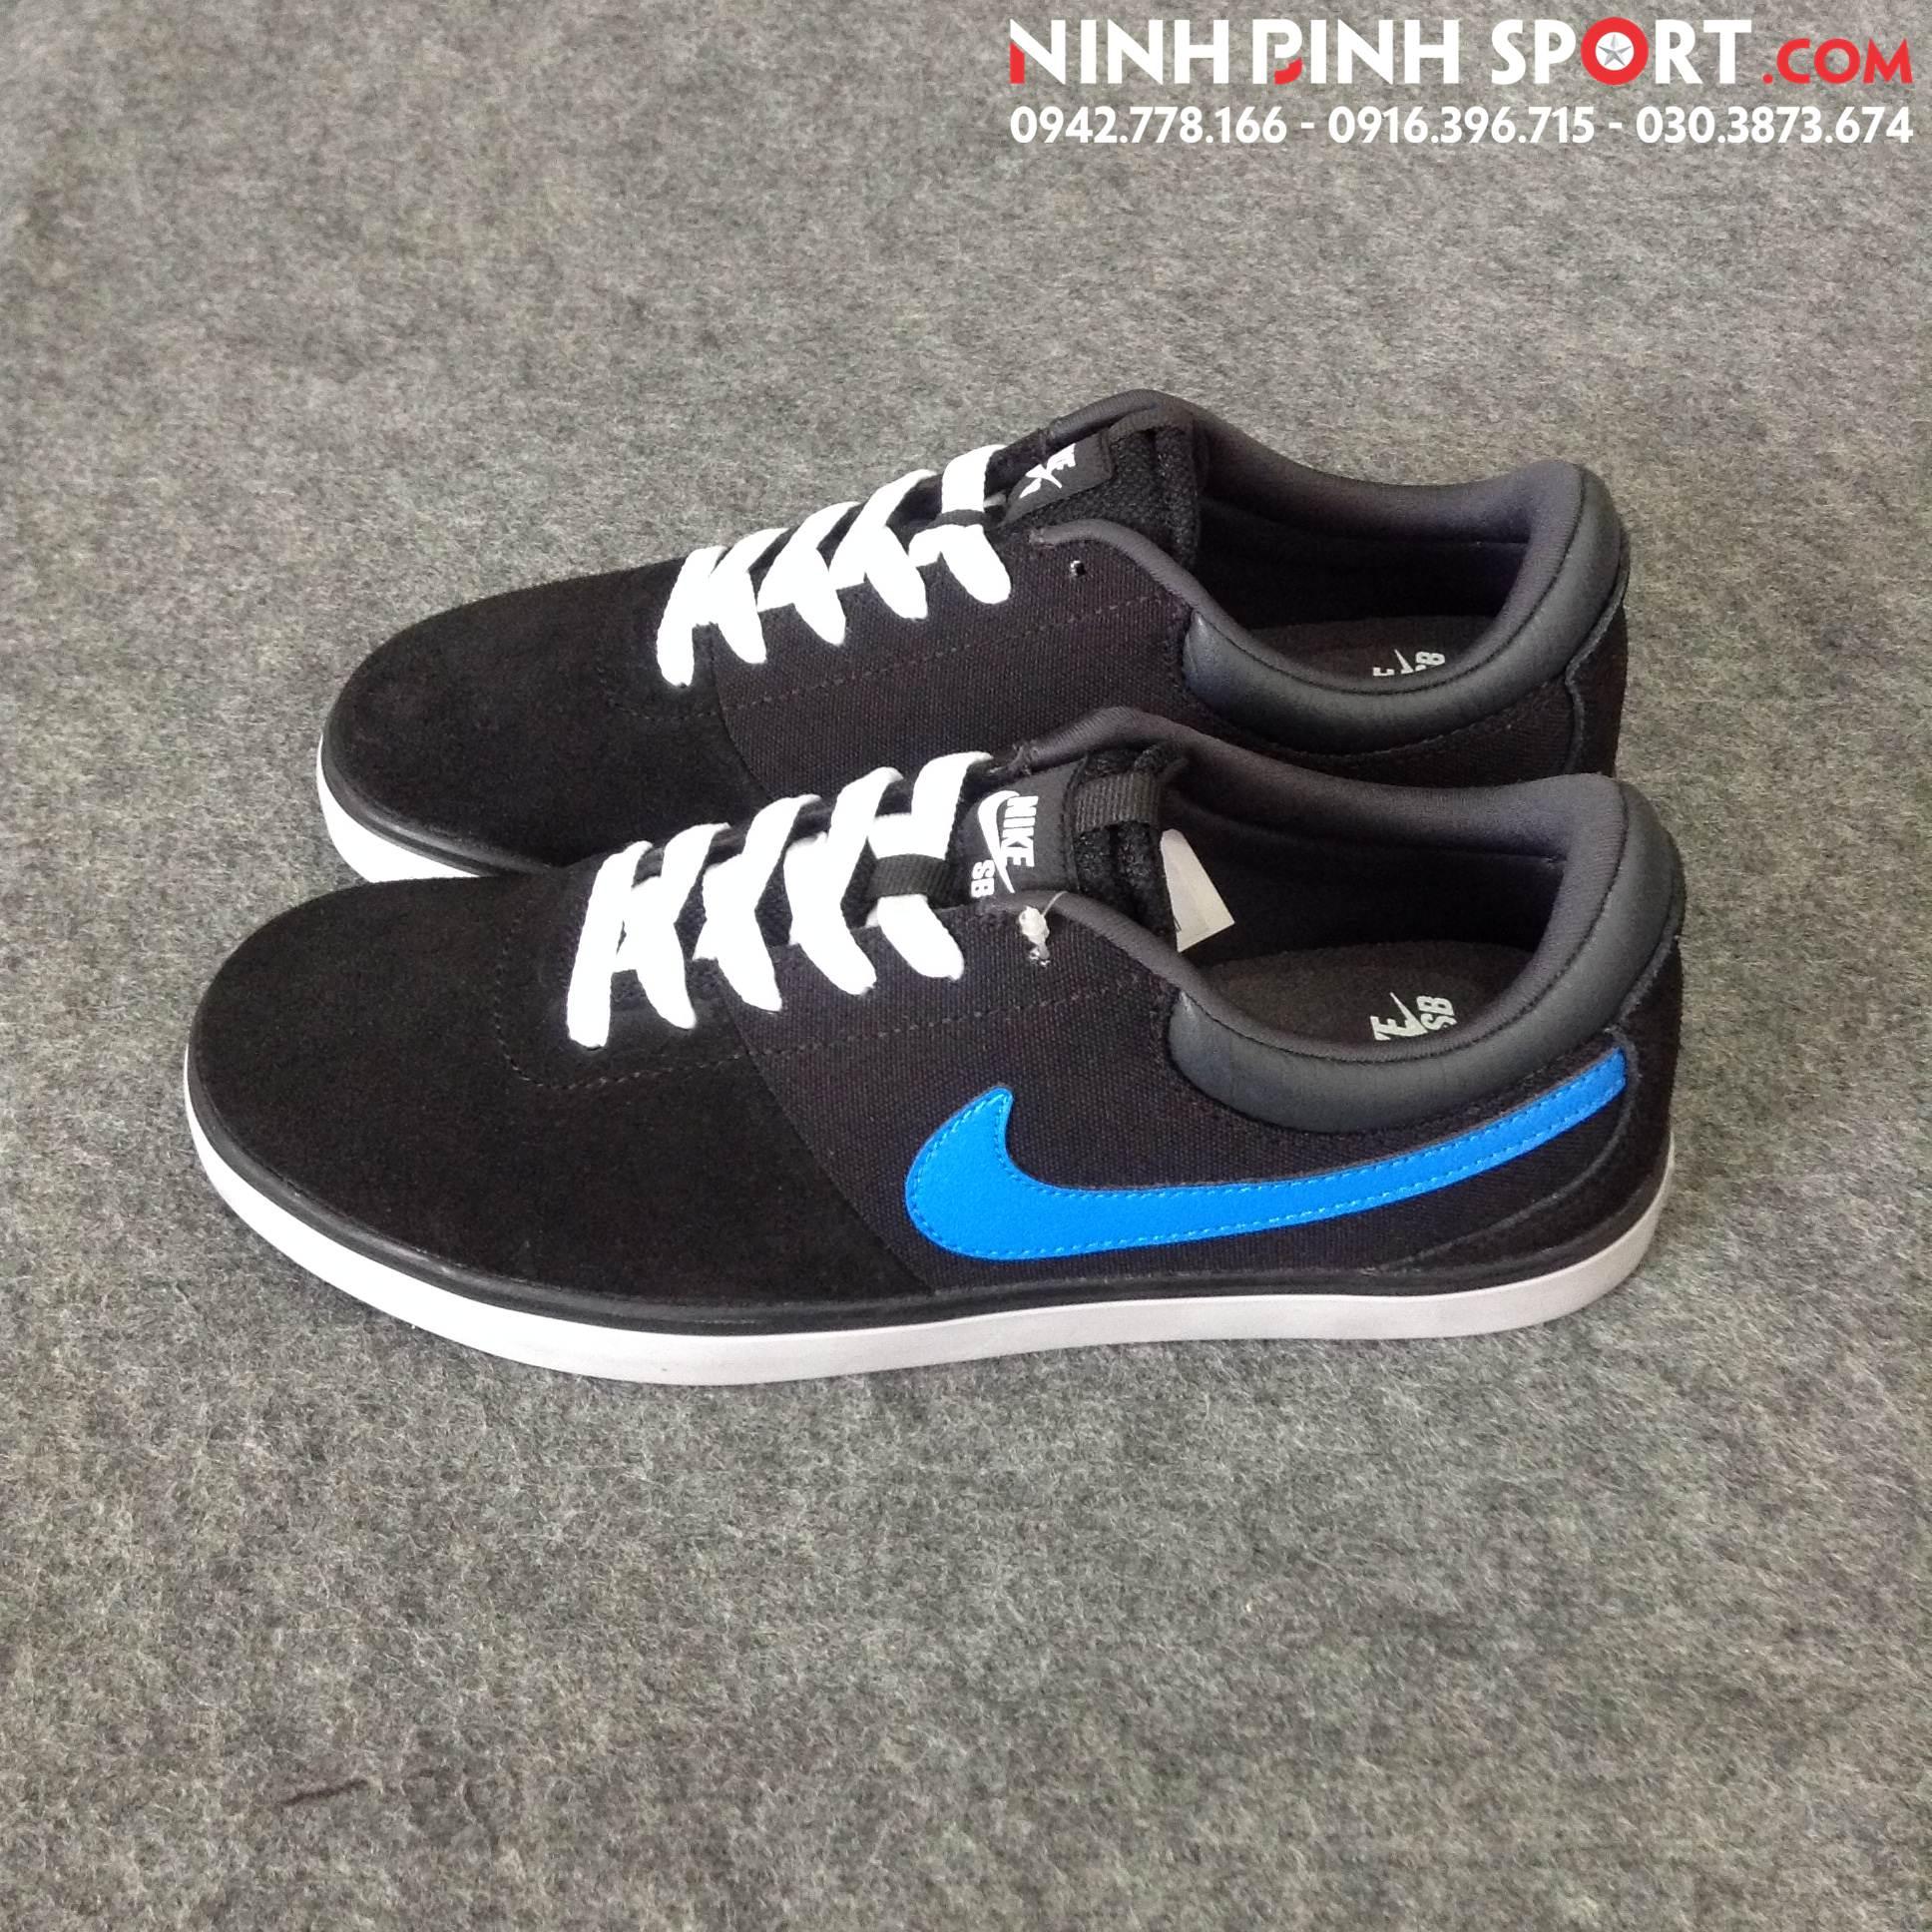 Giầy thể thao nam Nike Rabona lr 641747-040